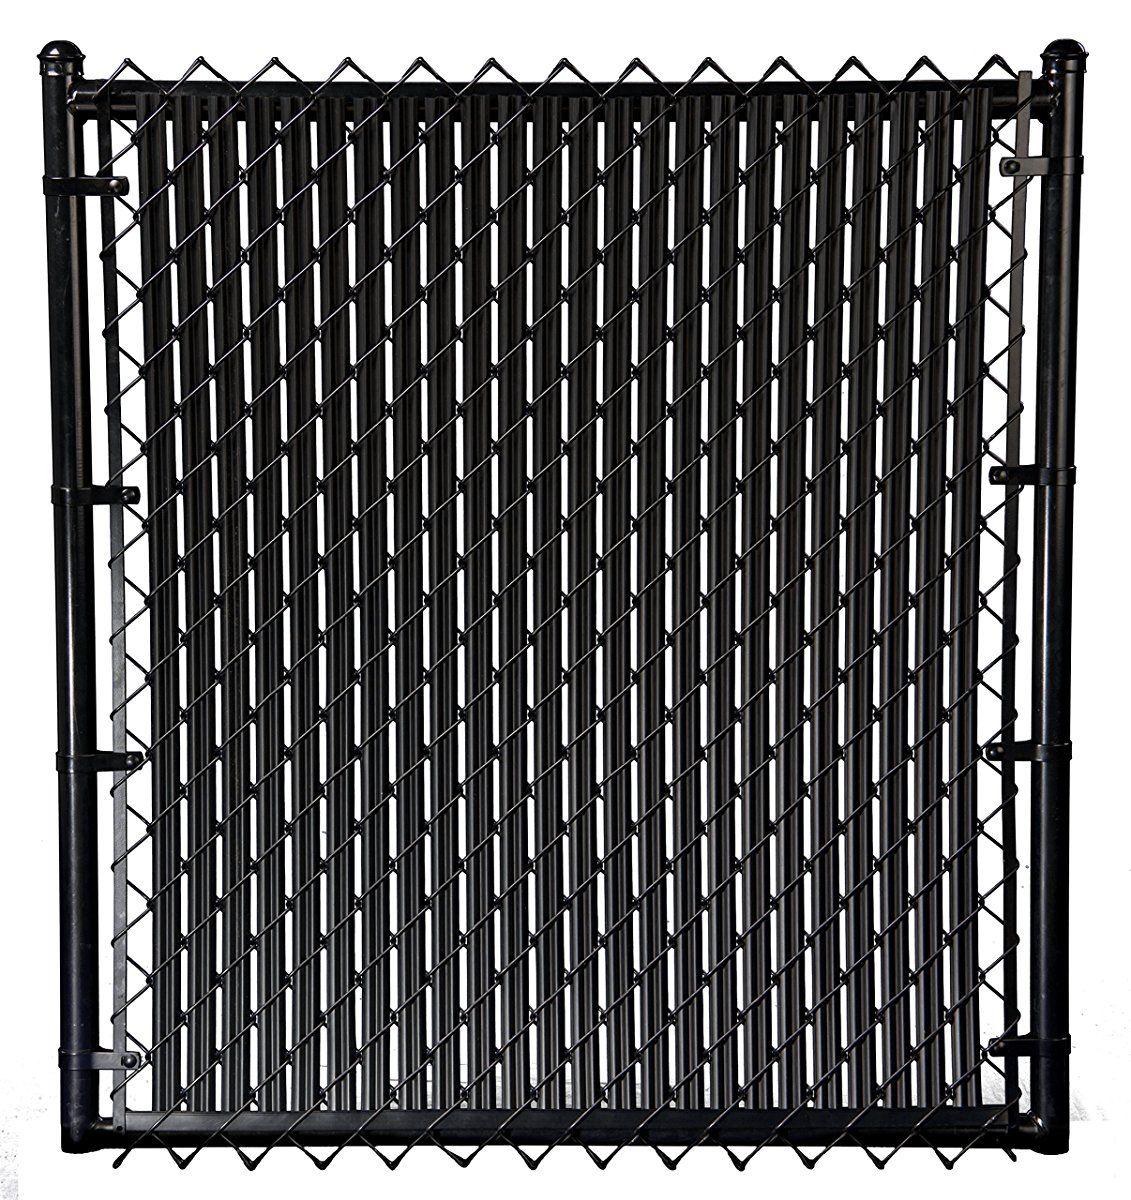 4ft Black Ridged Slats For Chain Link Fence Black Chain Link Fence Painted Chain Link Fence Chain Link Fence